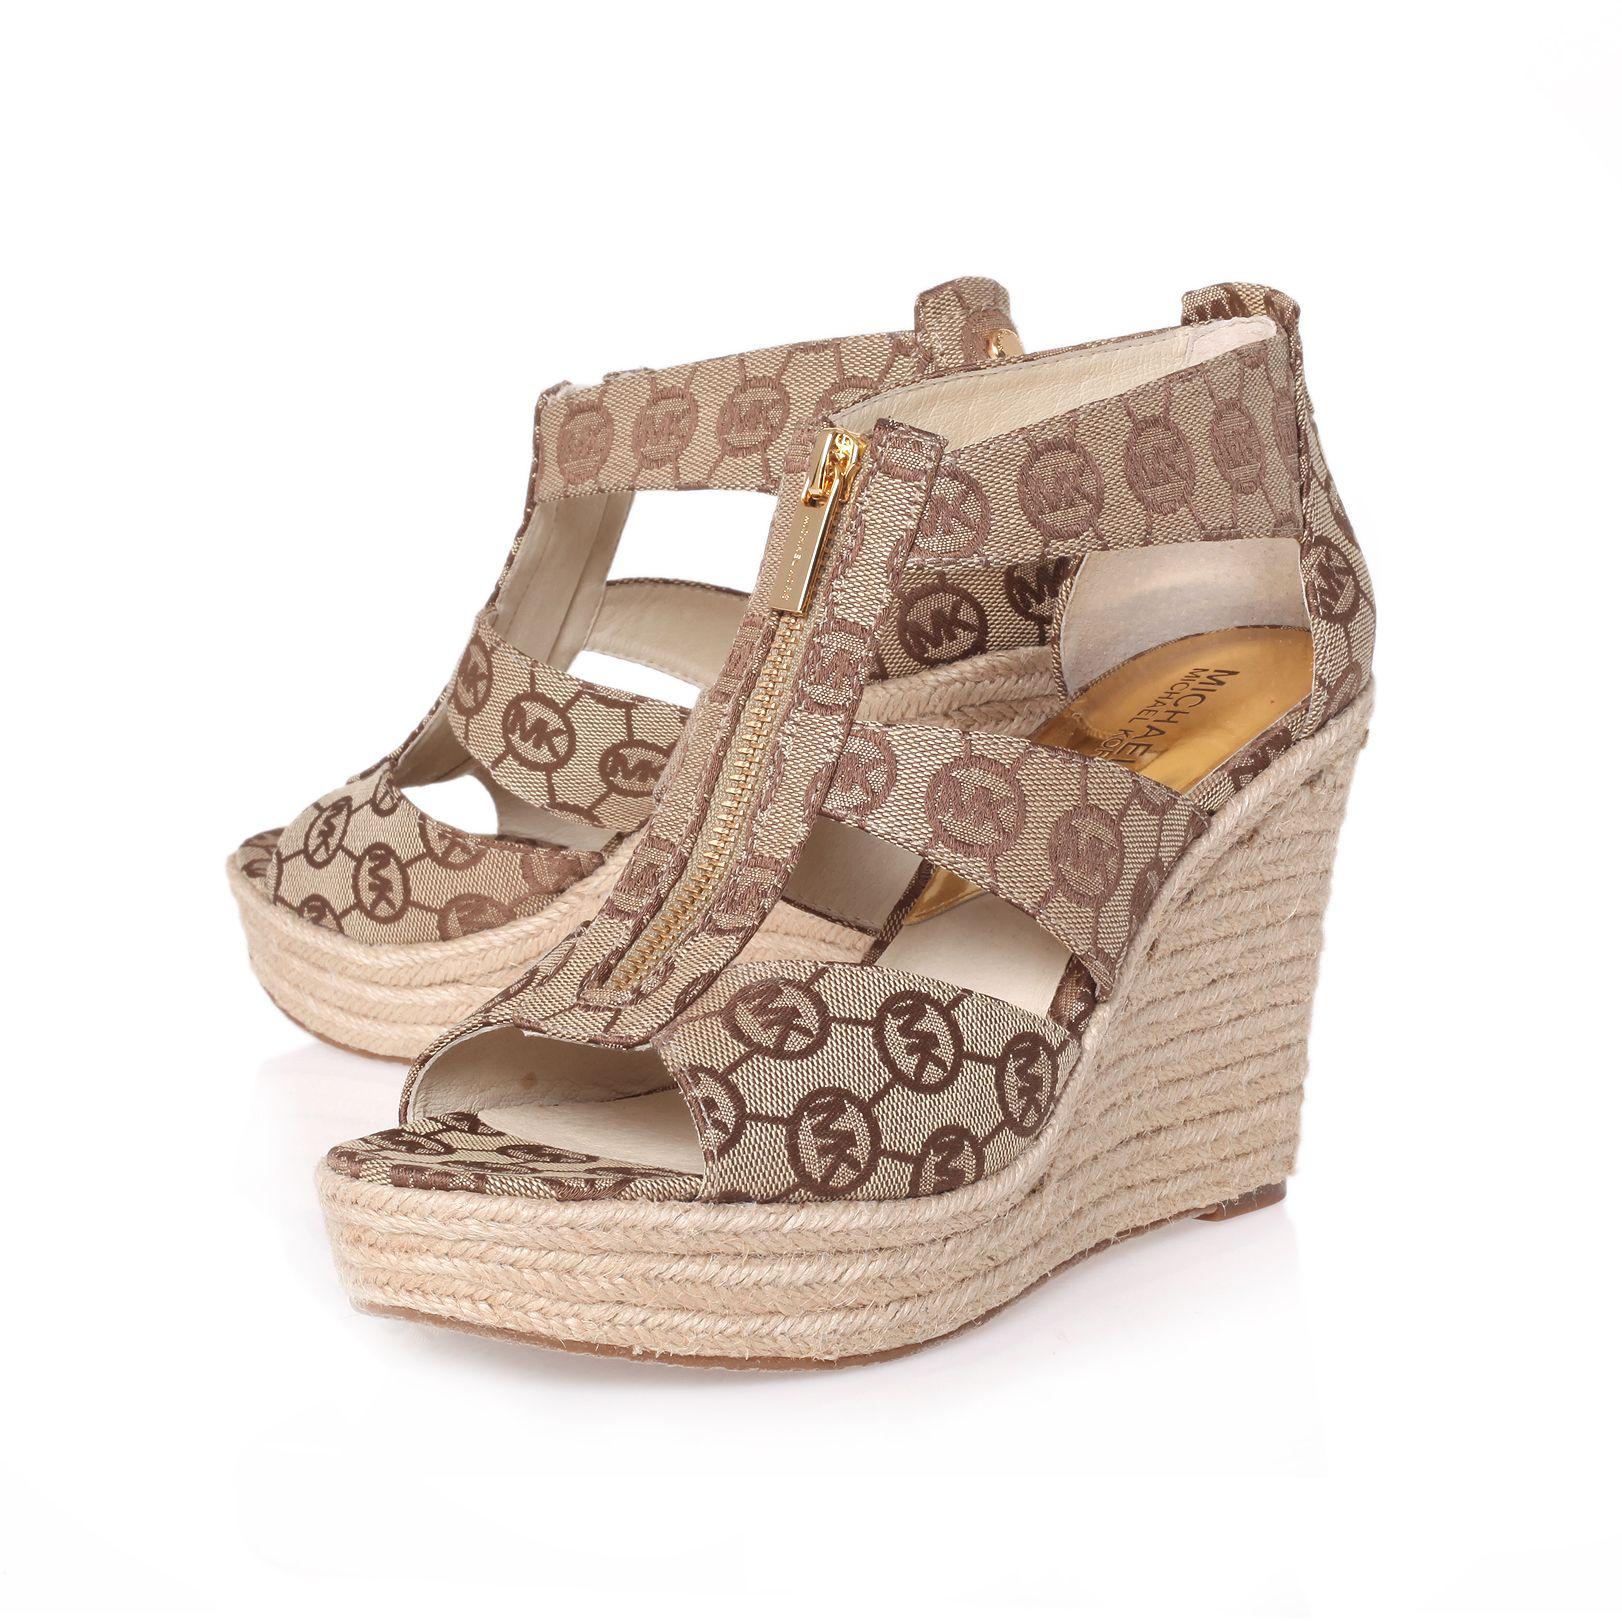 Michael Kors Baby Shoes 2014 michael kors damita